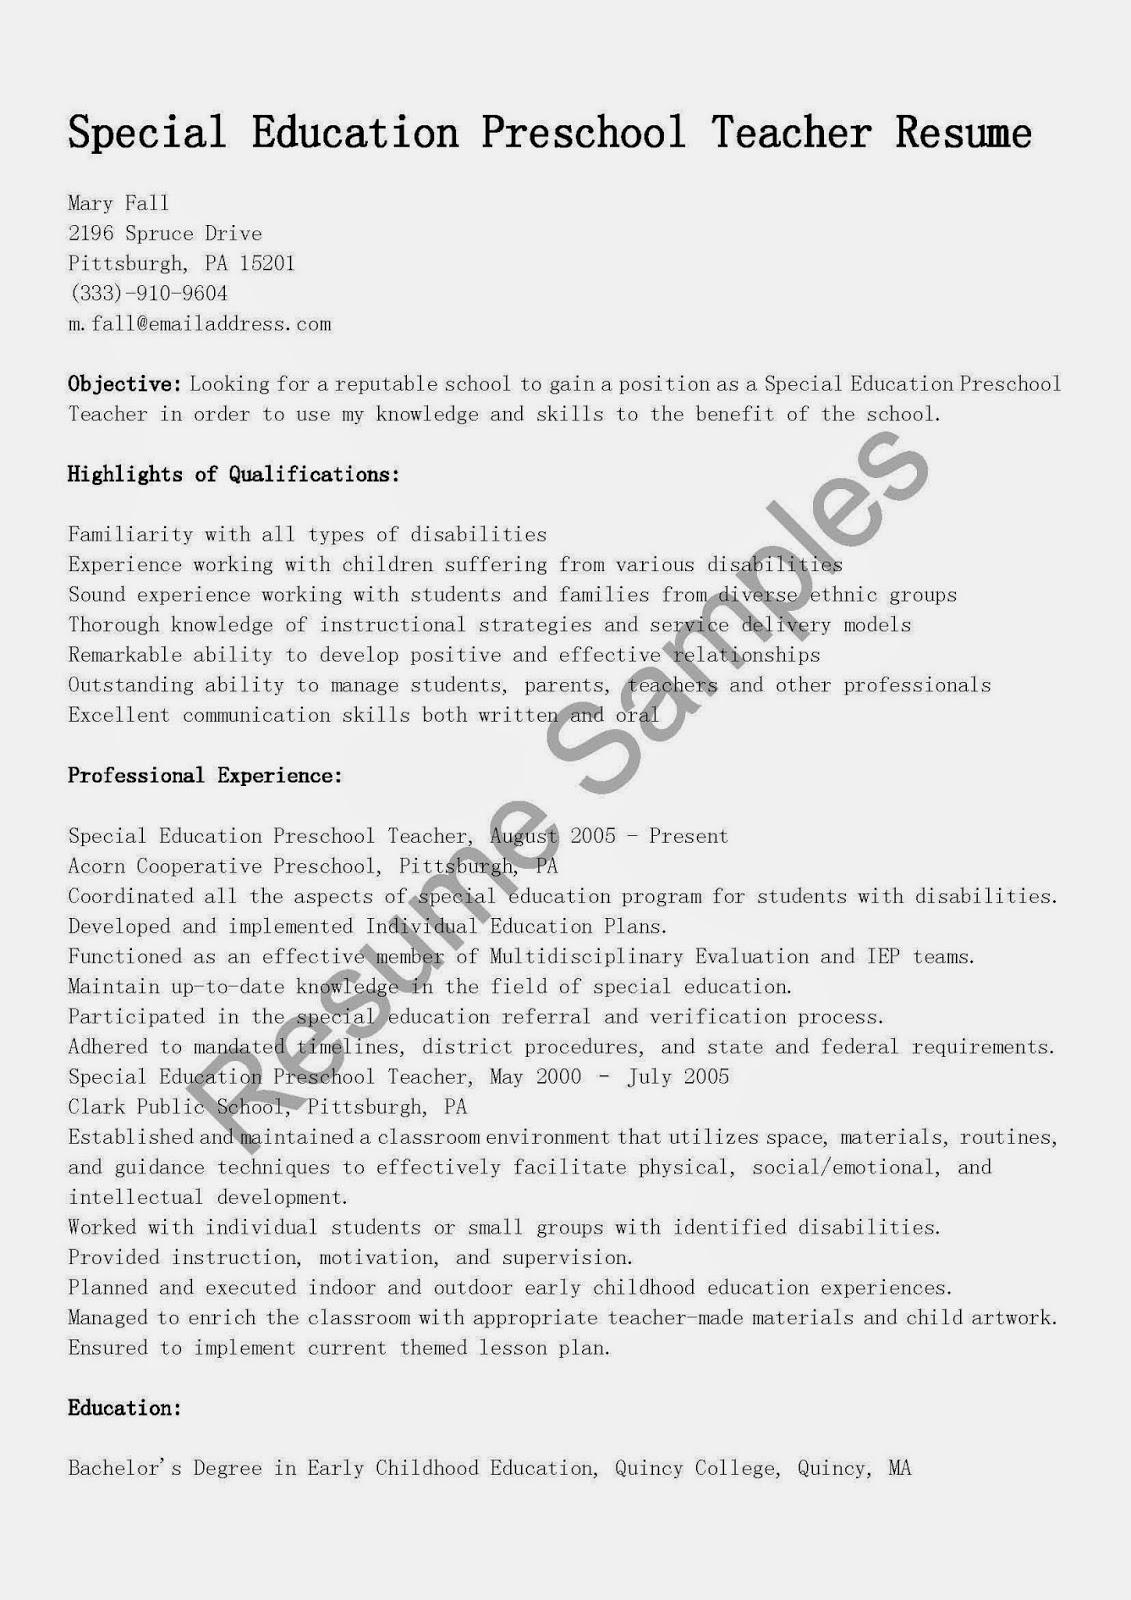 resume samples special education preschool teacher resume